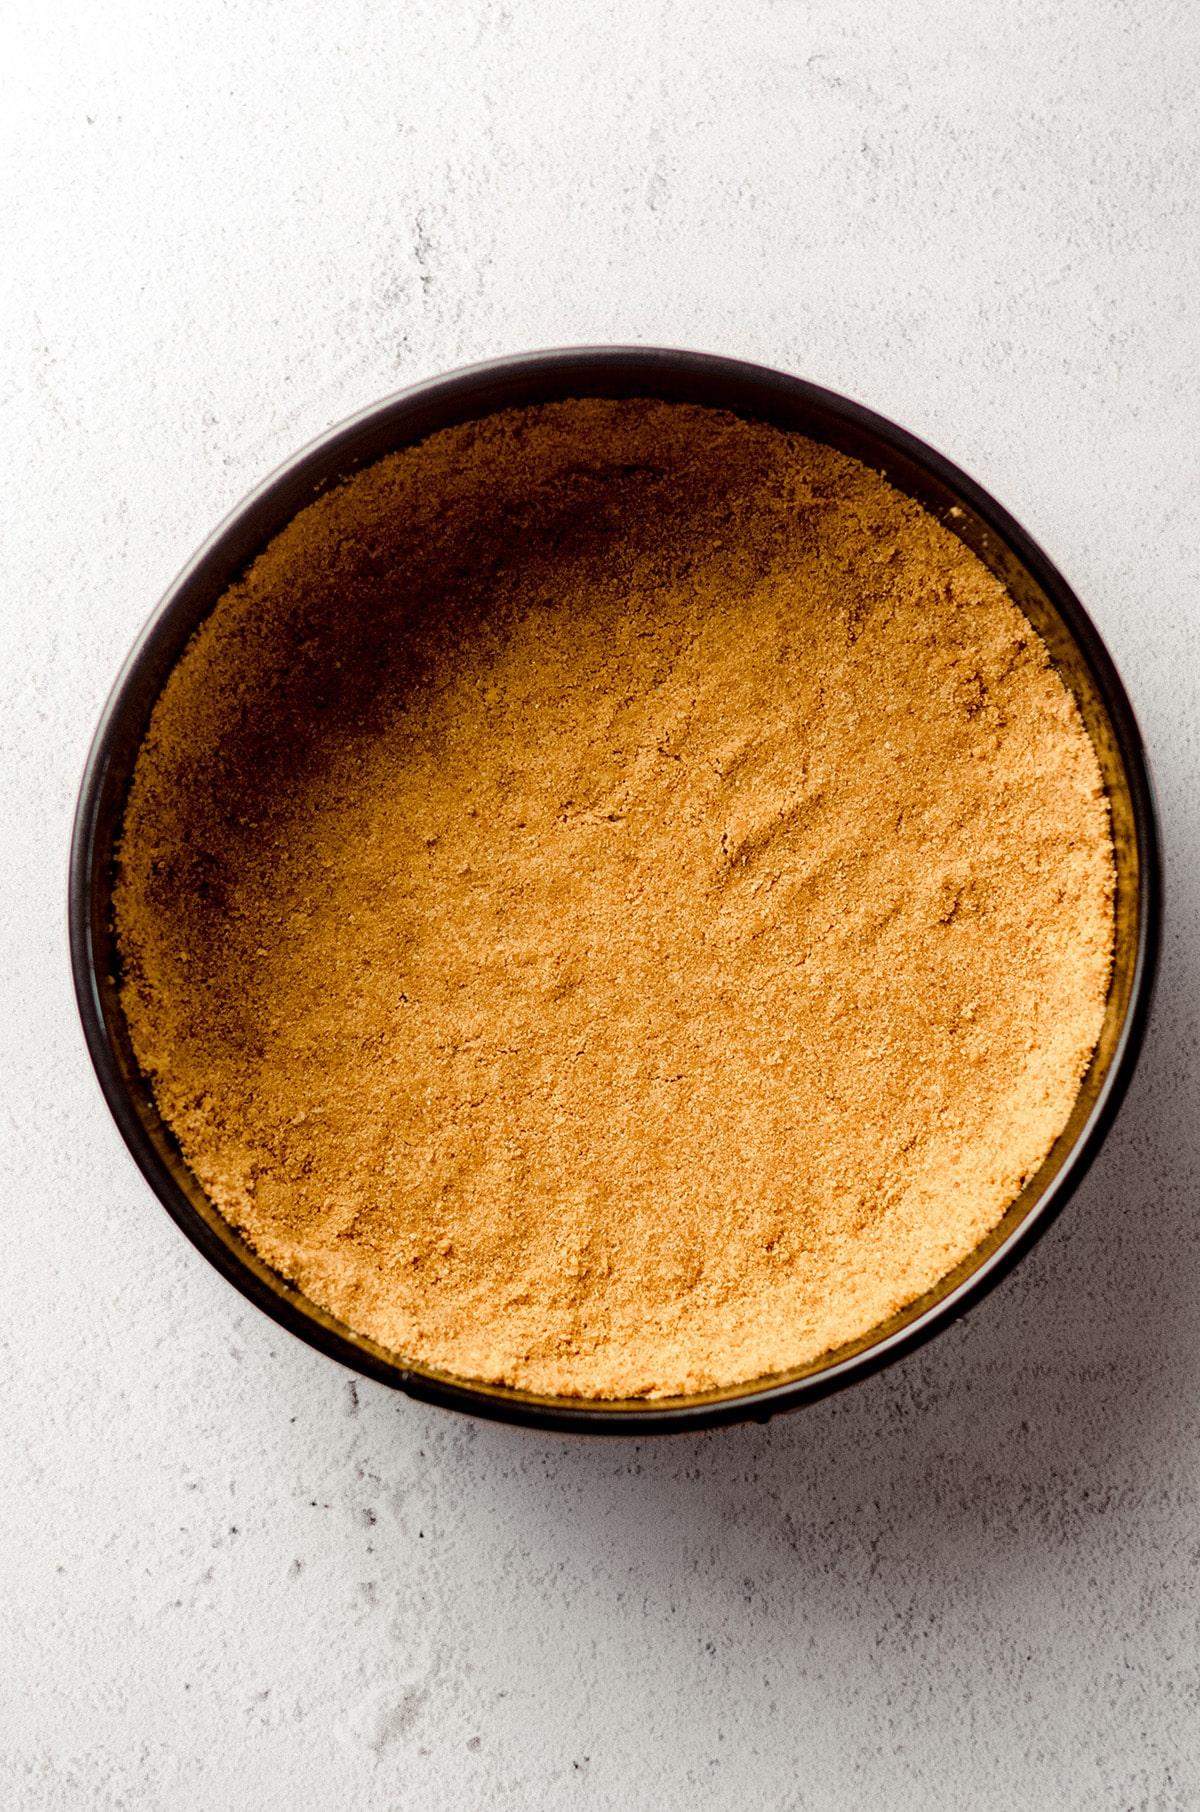 graham cracker crust in a springform pan